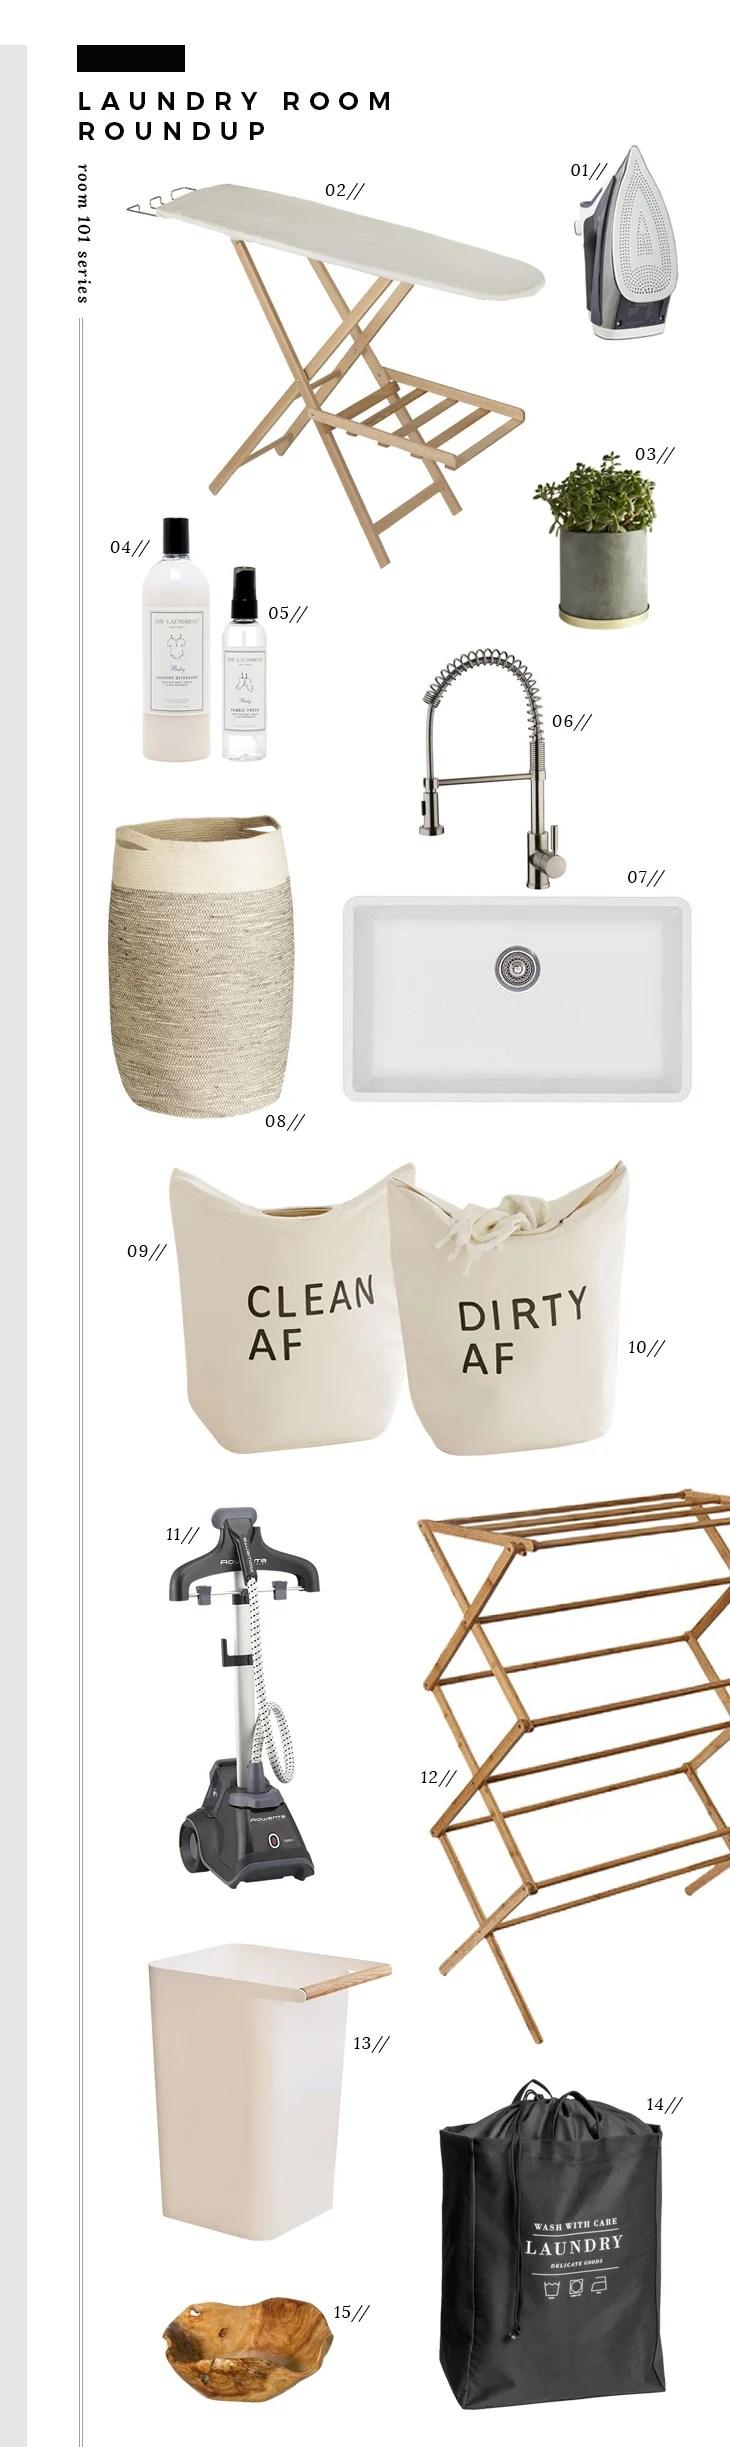 Room 101 - Laundry Room Roundup